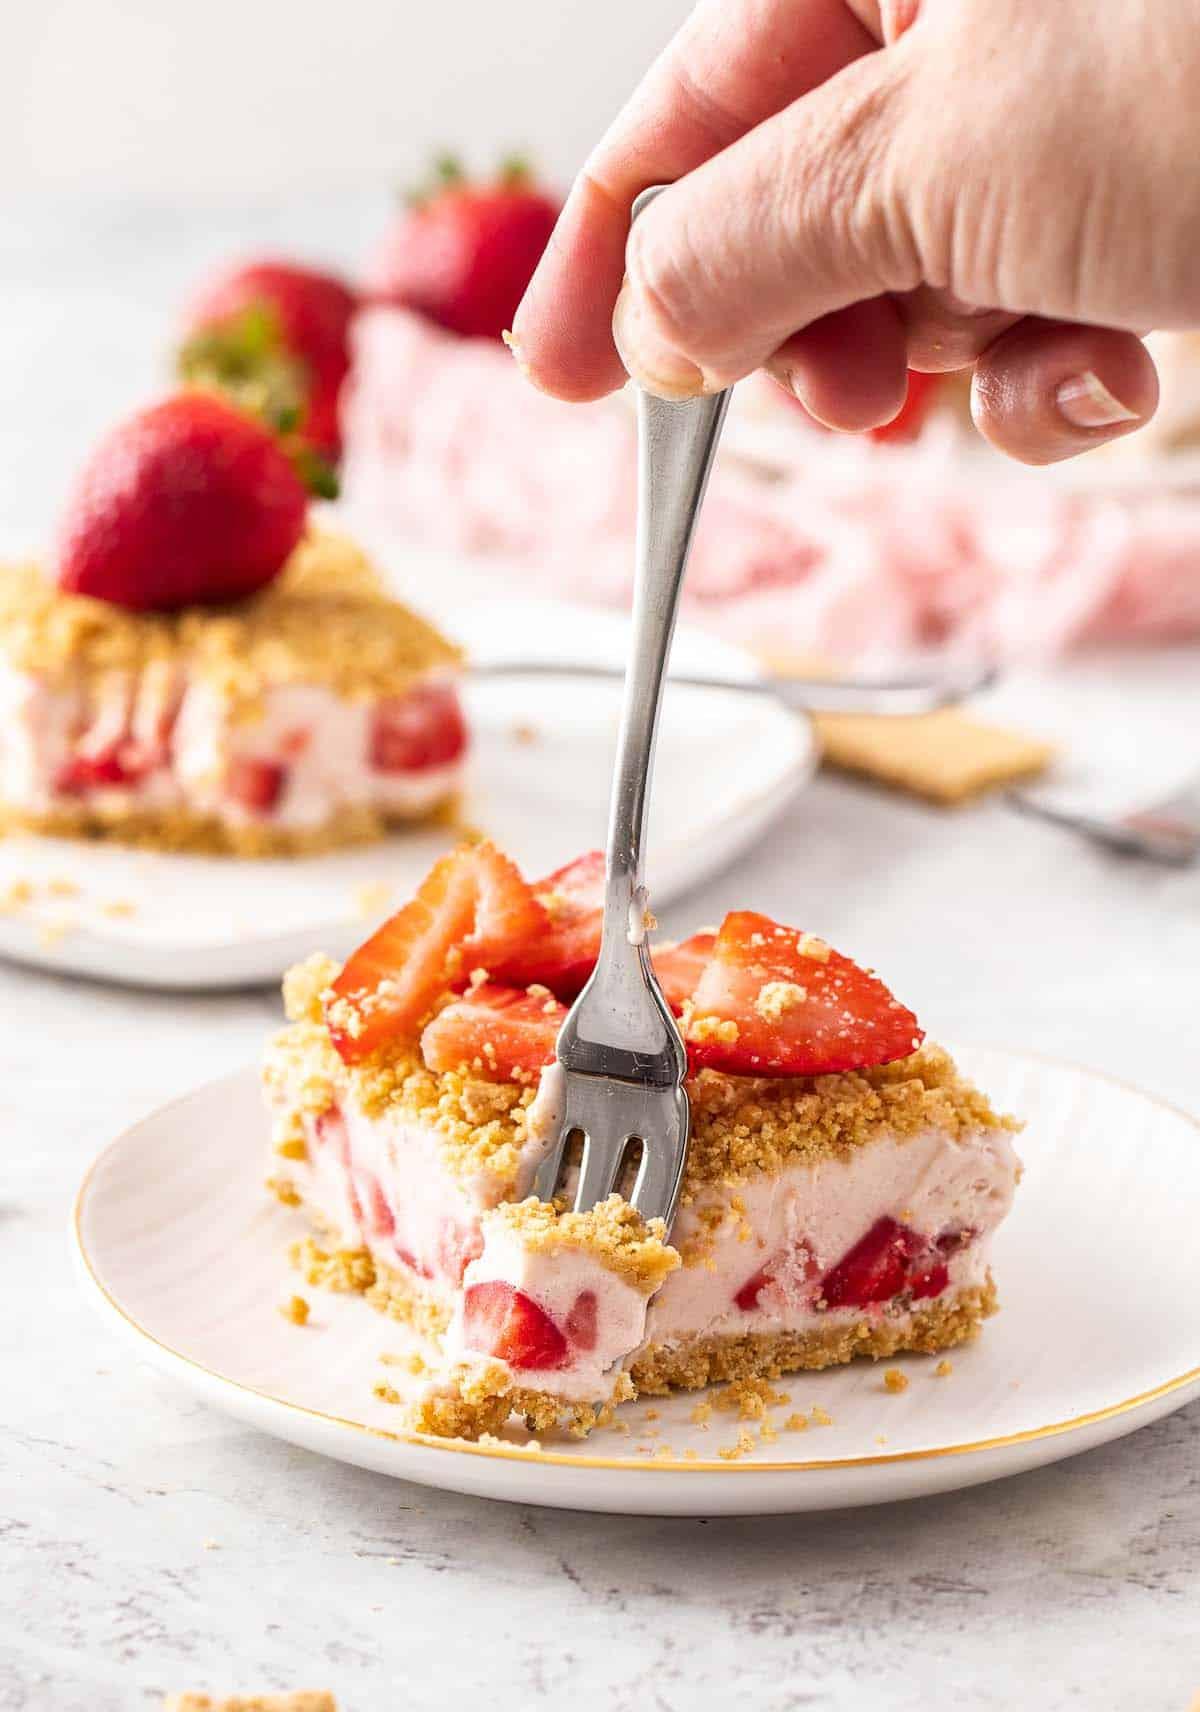 hand holding fork in strawberry dessert